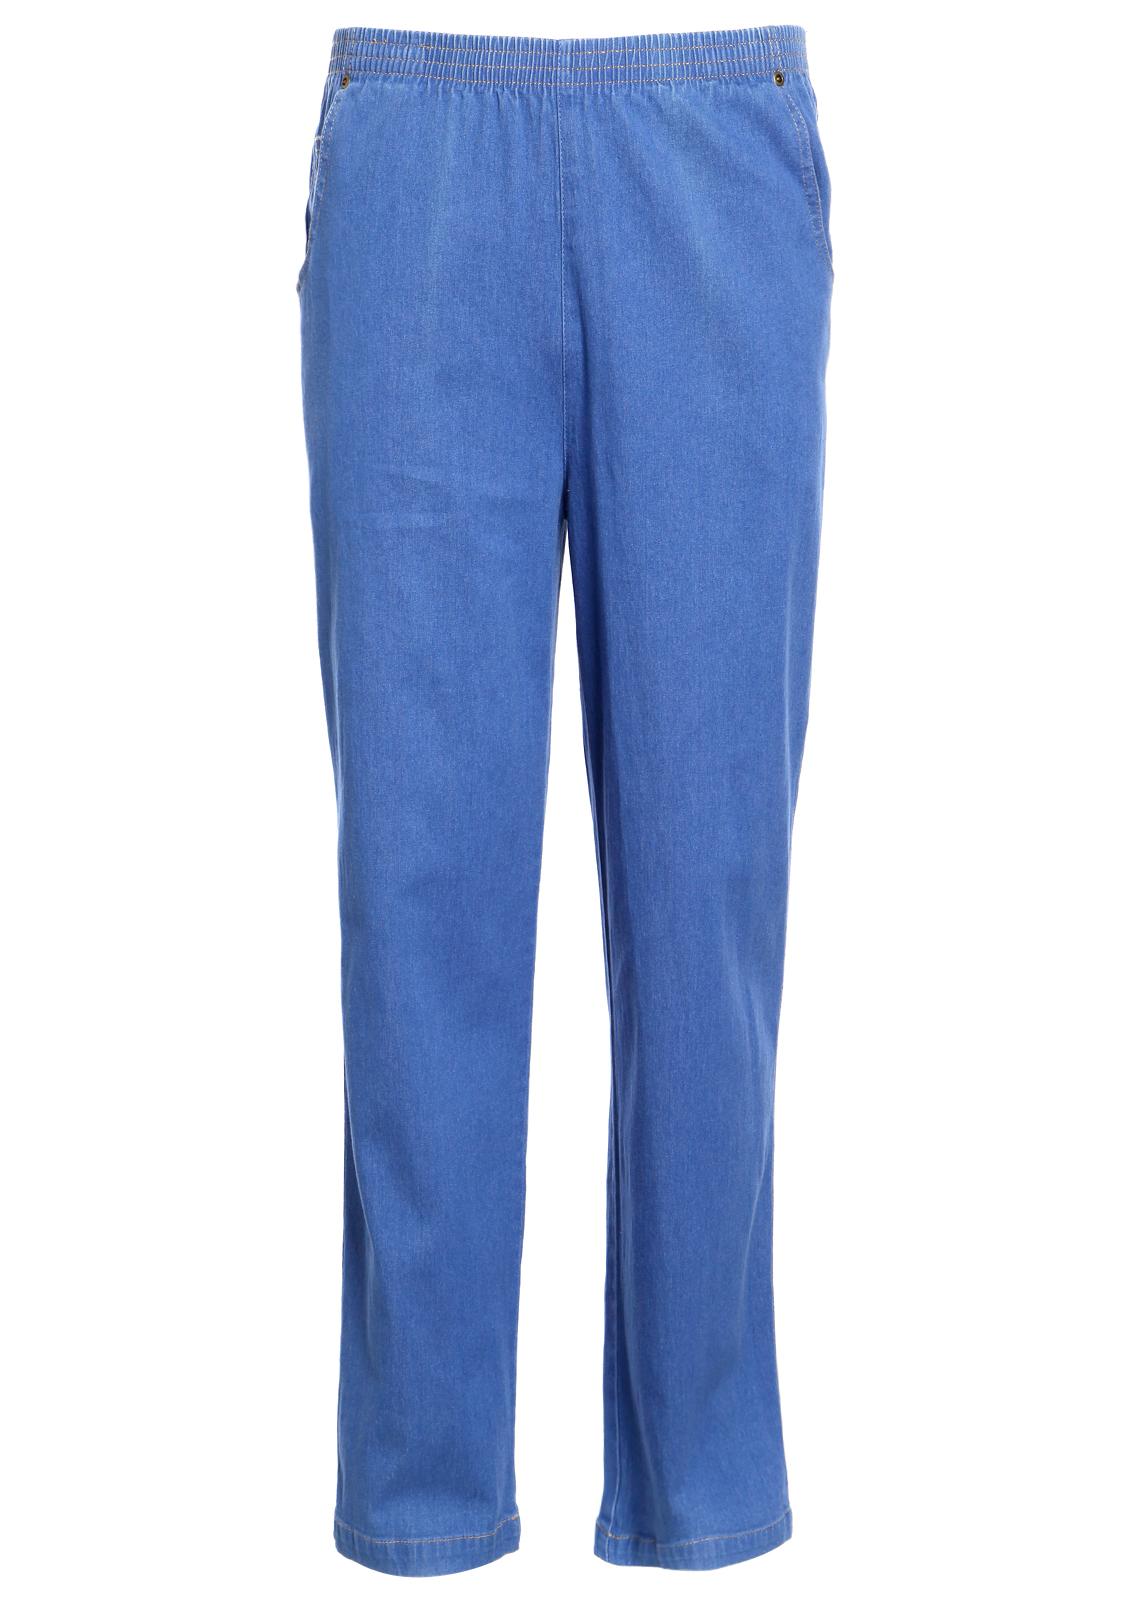 Koret Women Elastic Waist Relax Denim Jeans Pencil ...